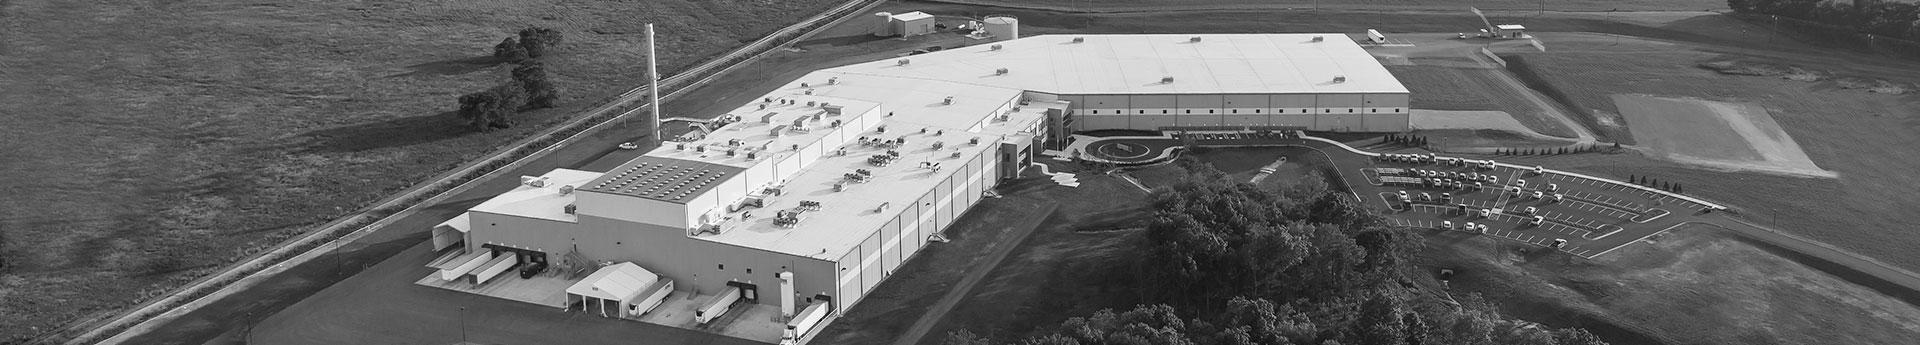 Aerial photography of Dogstar Kitchens - Award-winning DogStar Kitchens, Auburn, Kentucky